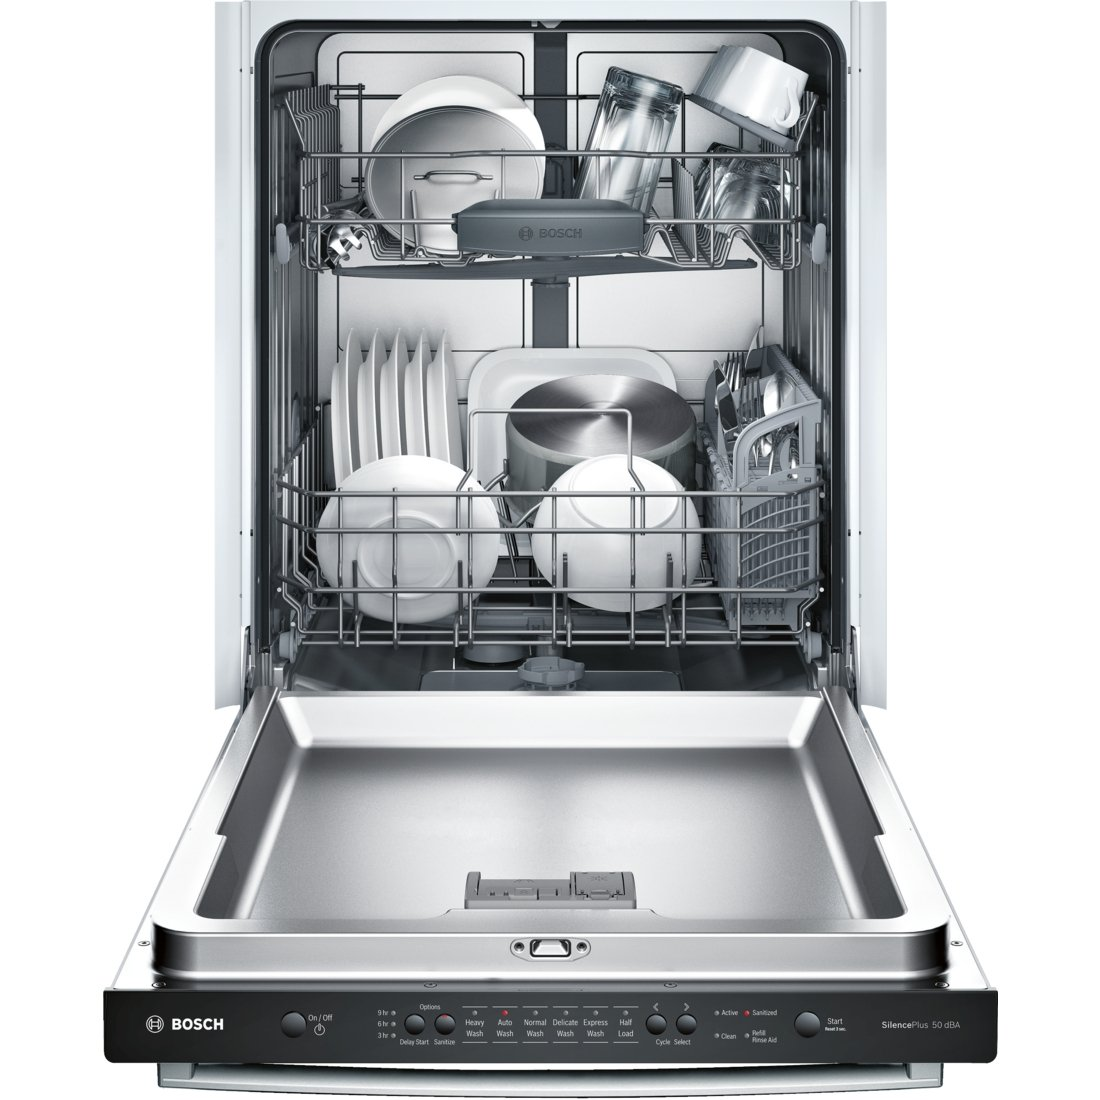 Amazon.com: Bosch SHX3AR75UC Ascenta - Lavavajillas (acero ...